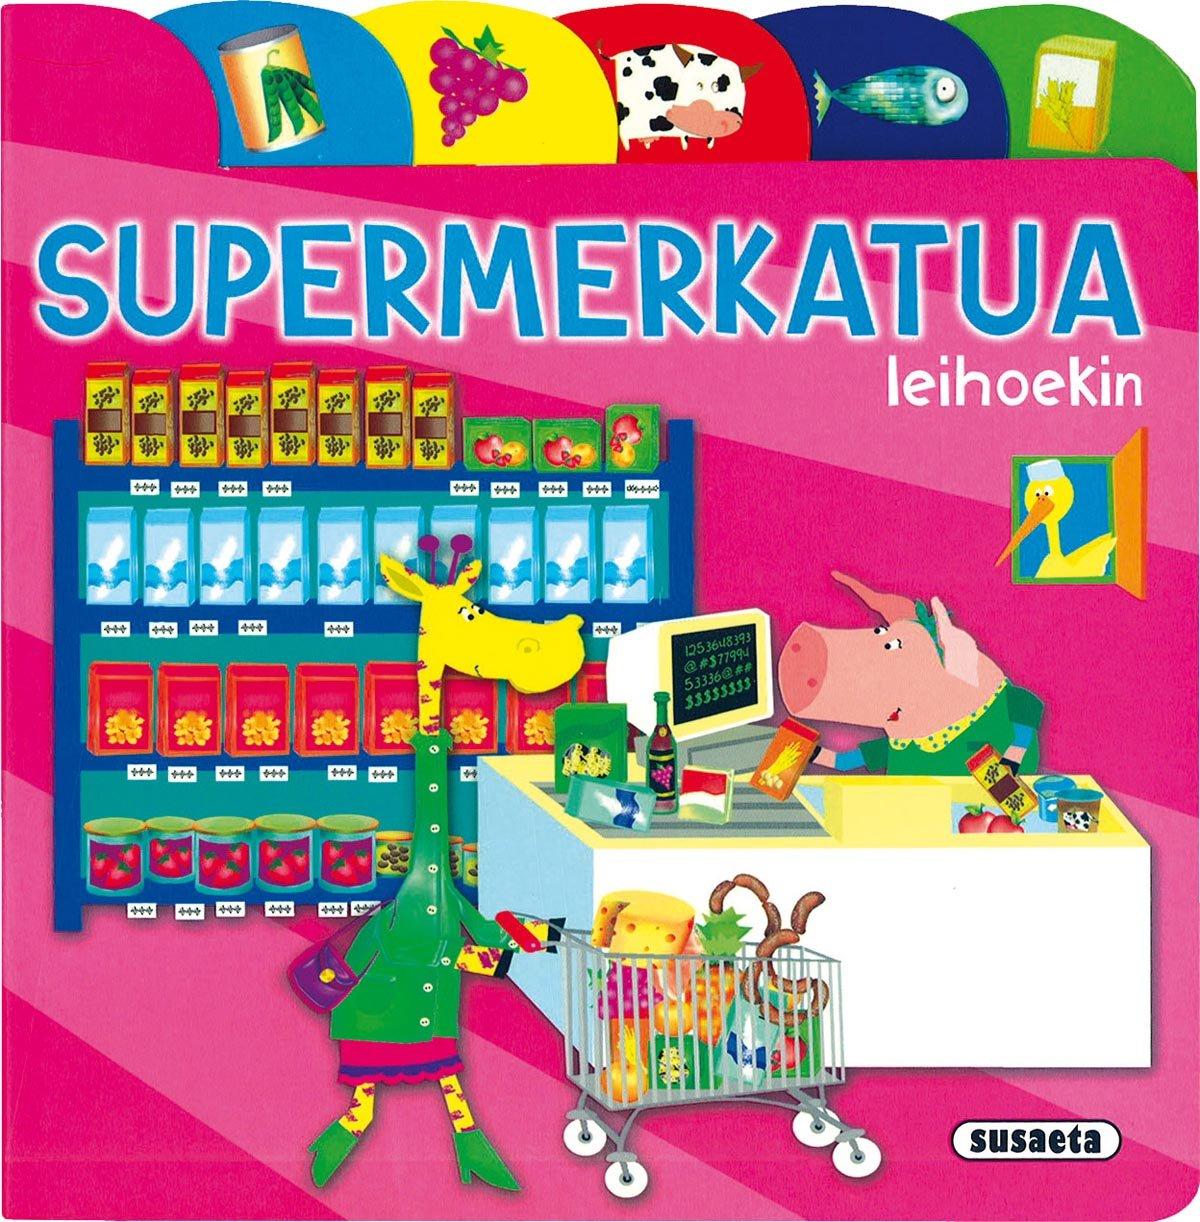 Supermerkatua (Aurkibideak Eta Leihoak) (Euskera) Libro de cartón – 9 nov 2016 Equipo Susaeta Tikal-Susaeta 8430549331 Libros Ilustrados